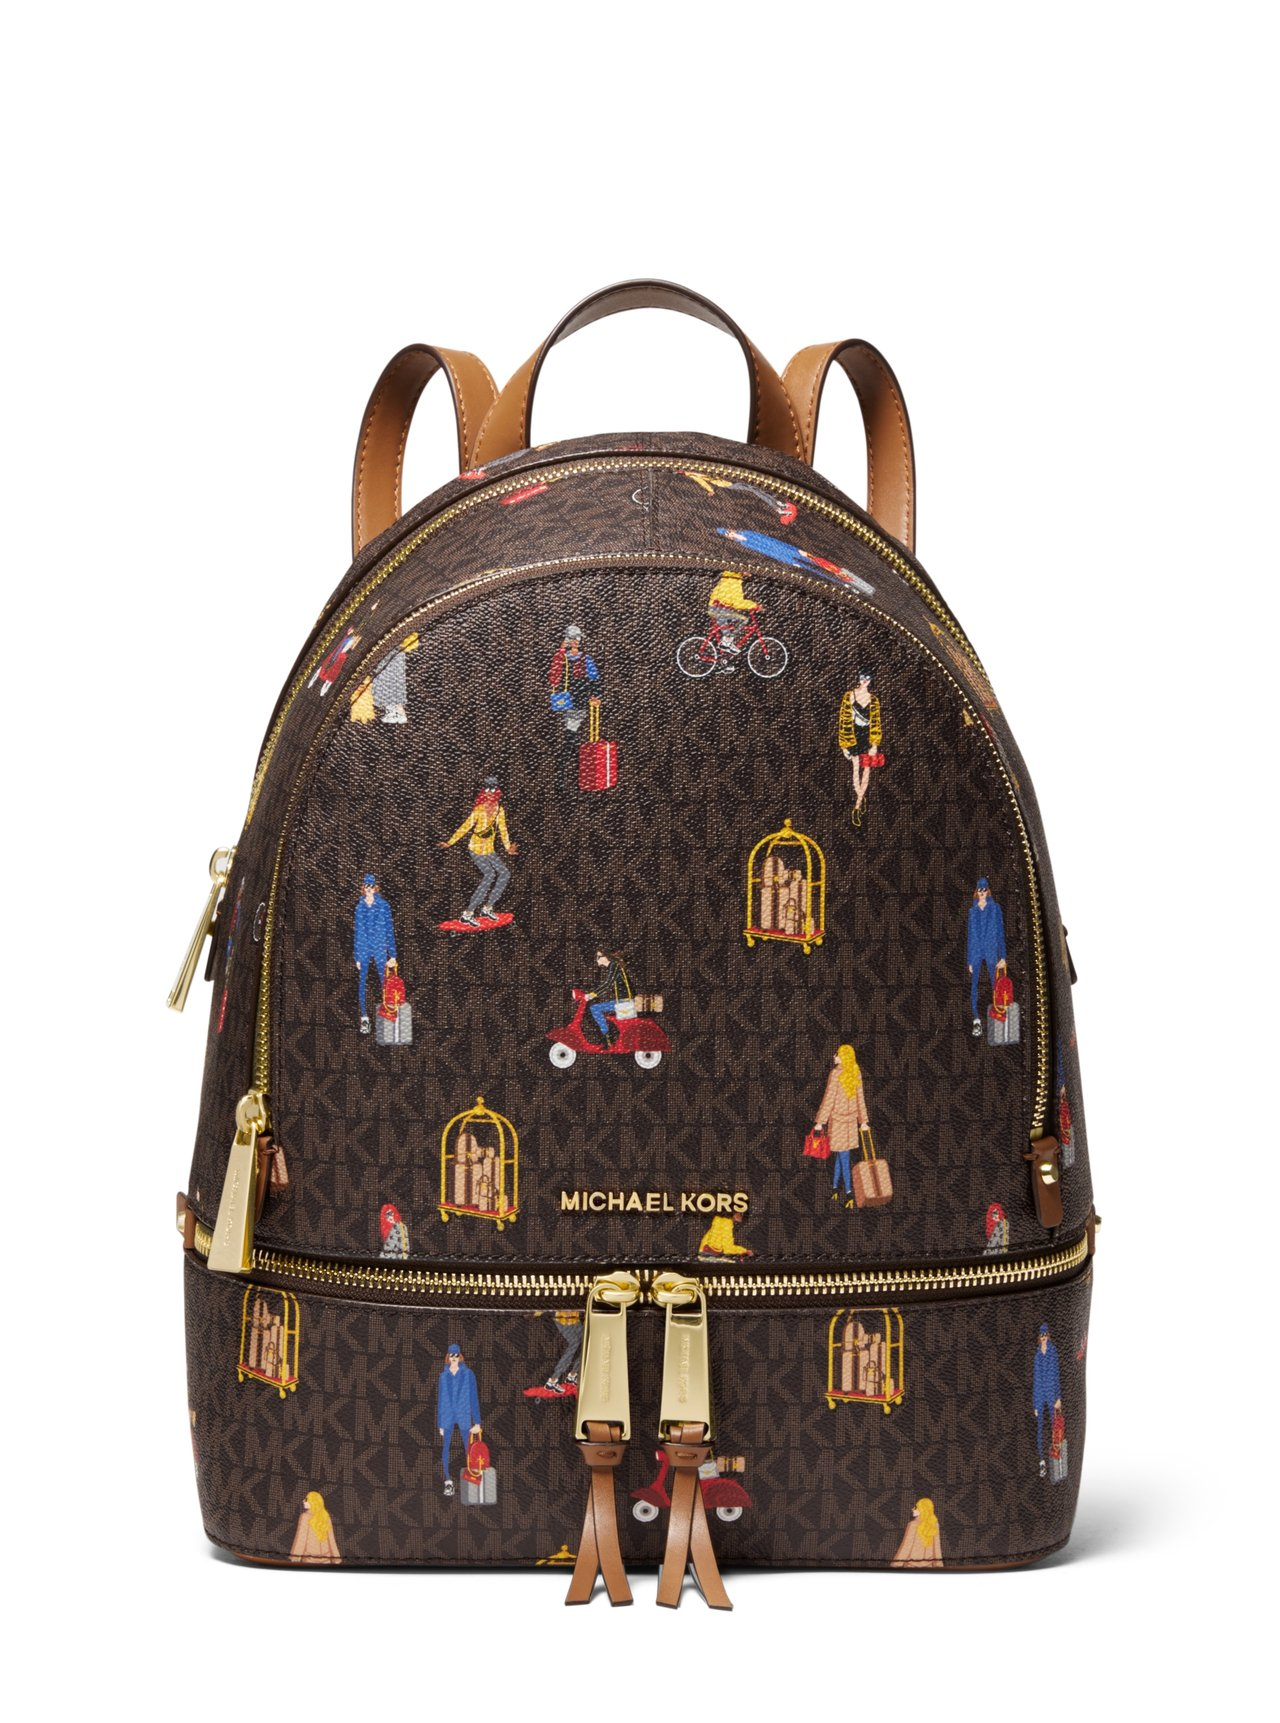 Jet Set 女郎彩繪後背包,售價16,700元。圖/MICHAEL KORS...